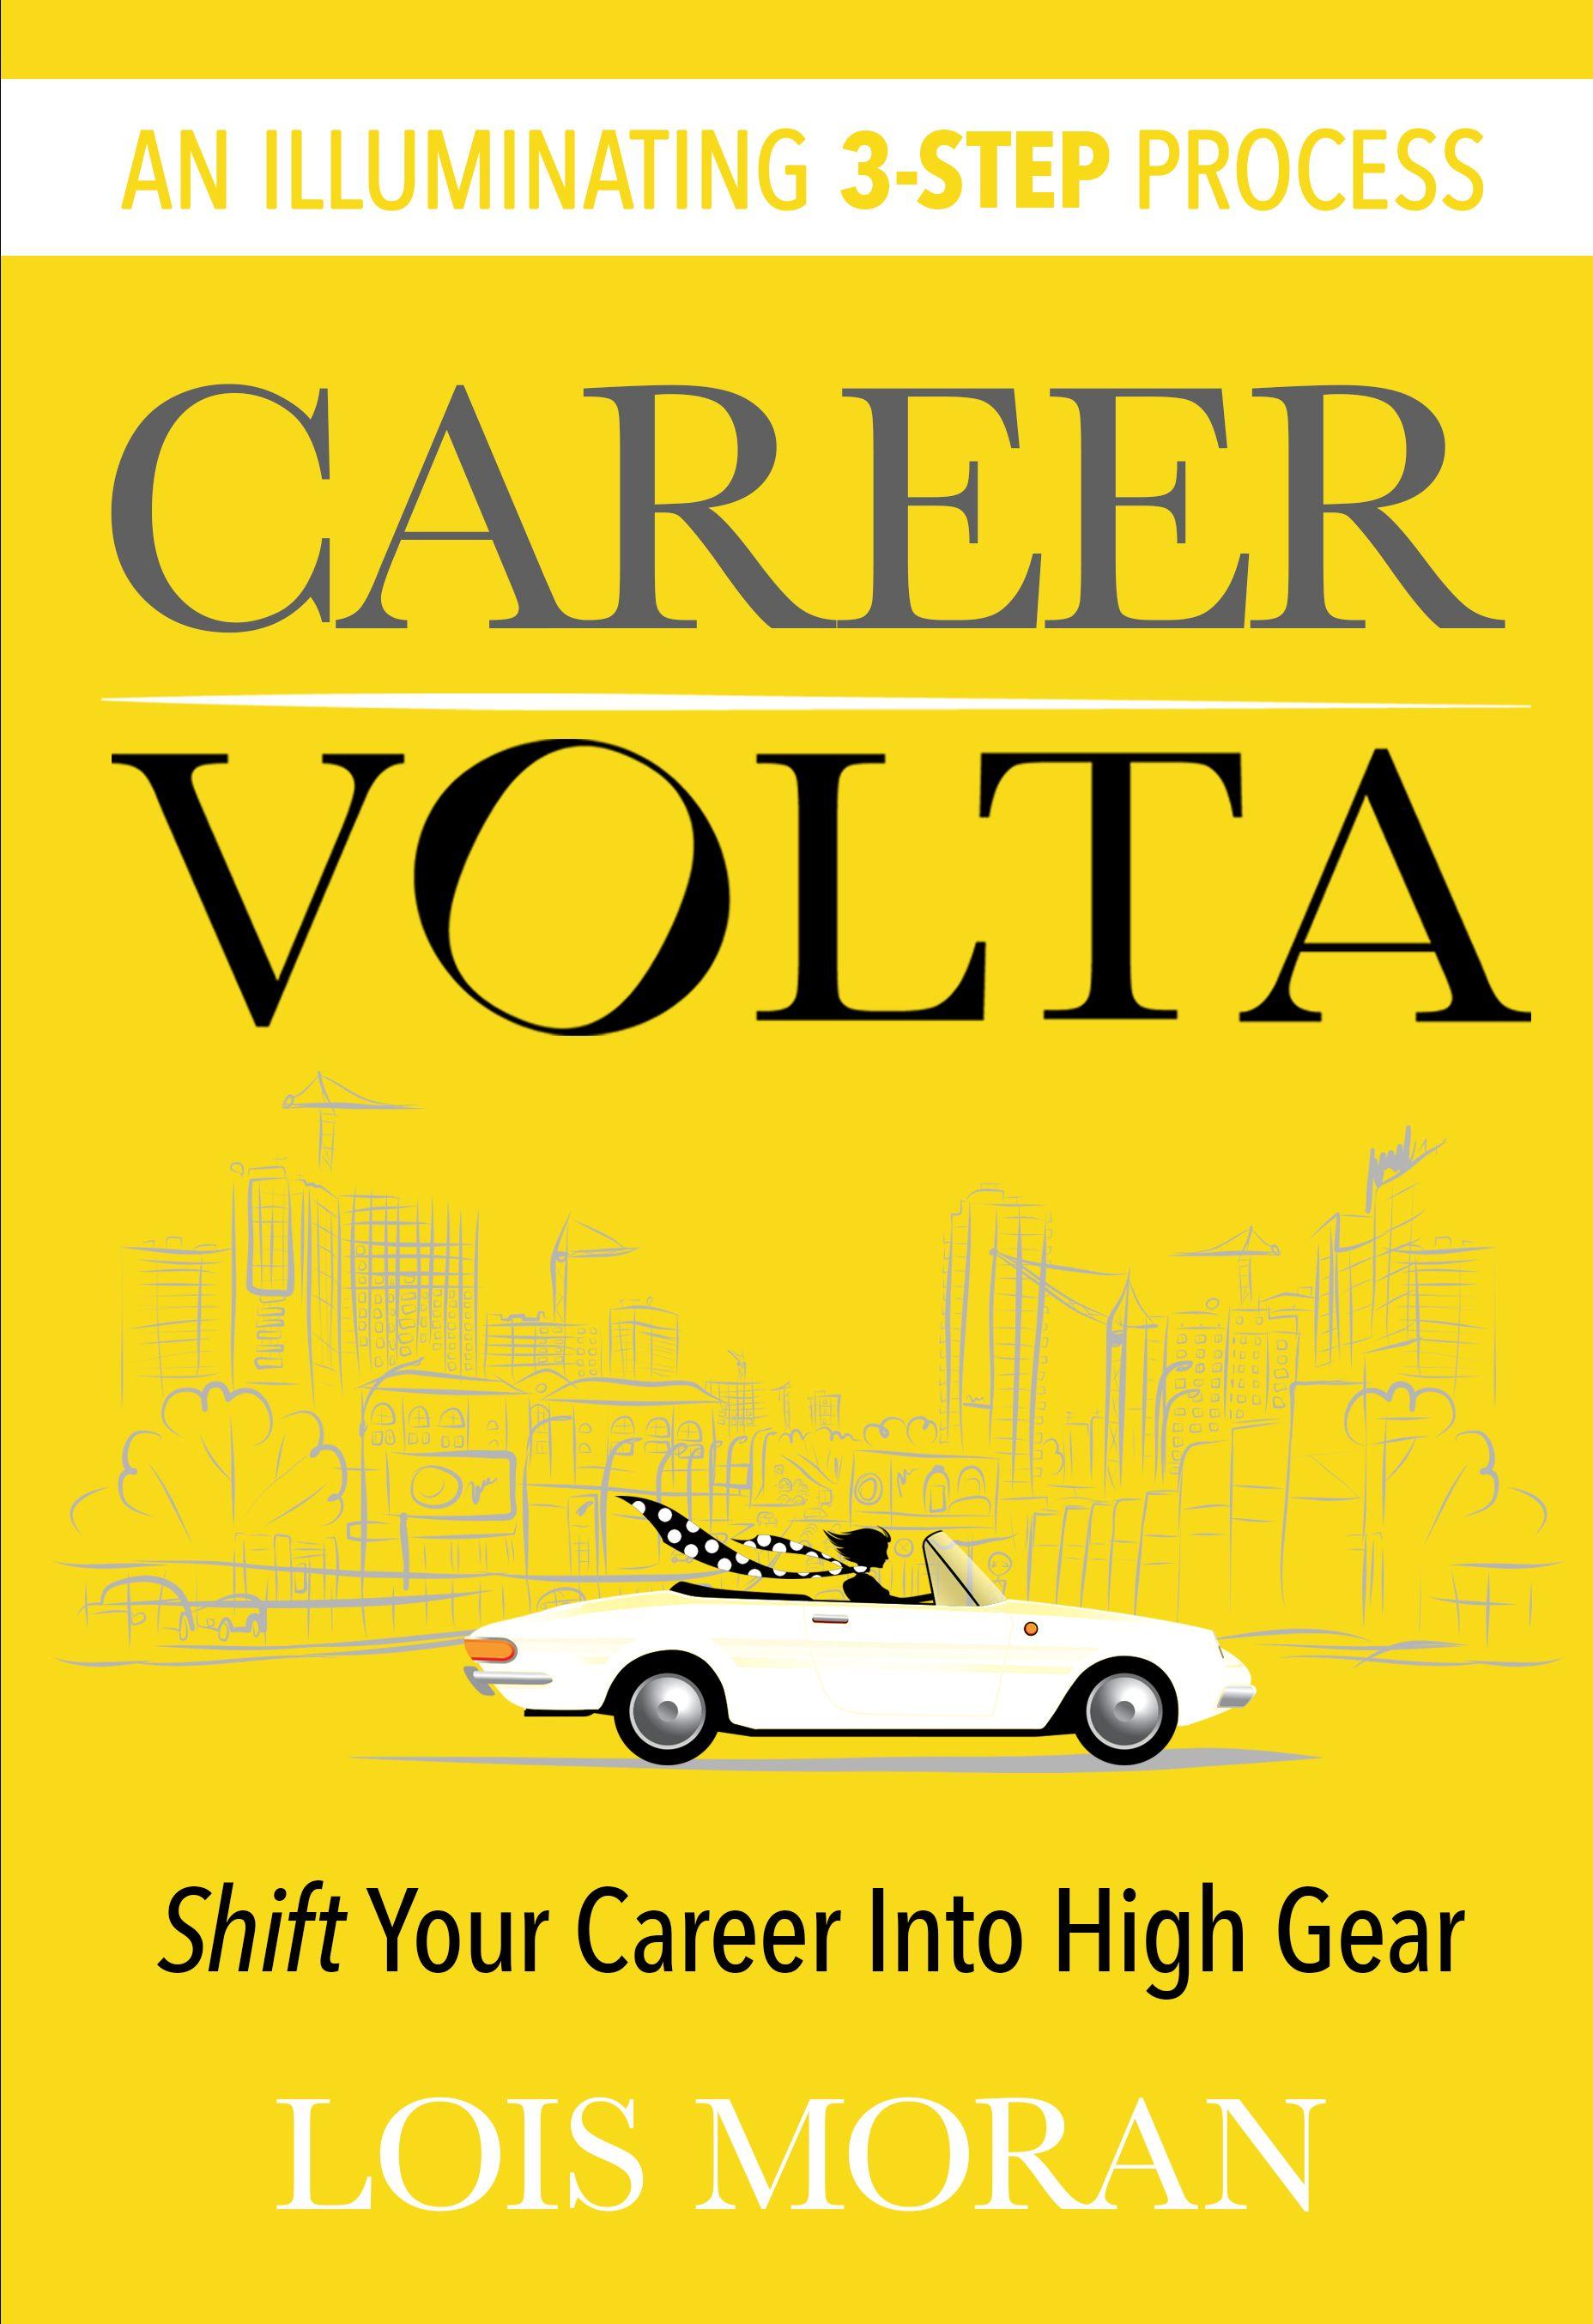 Book cover design business books career advancement career